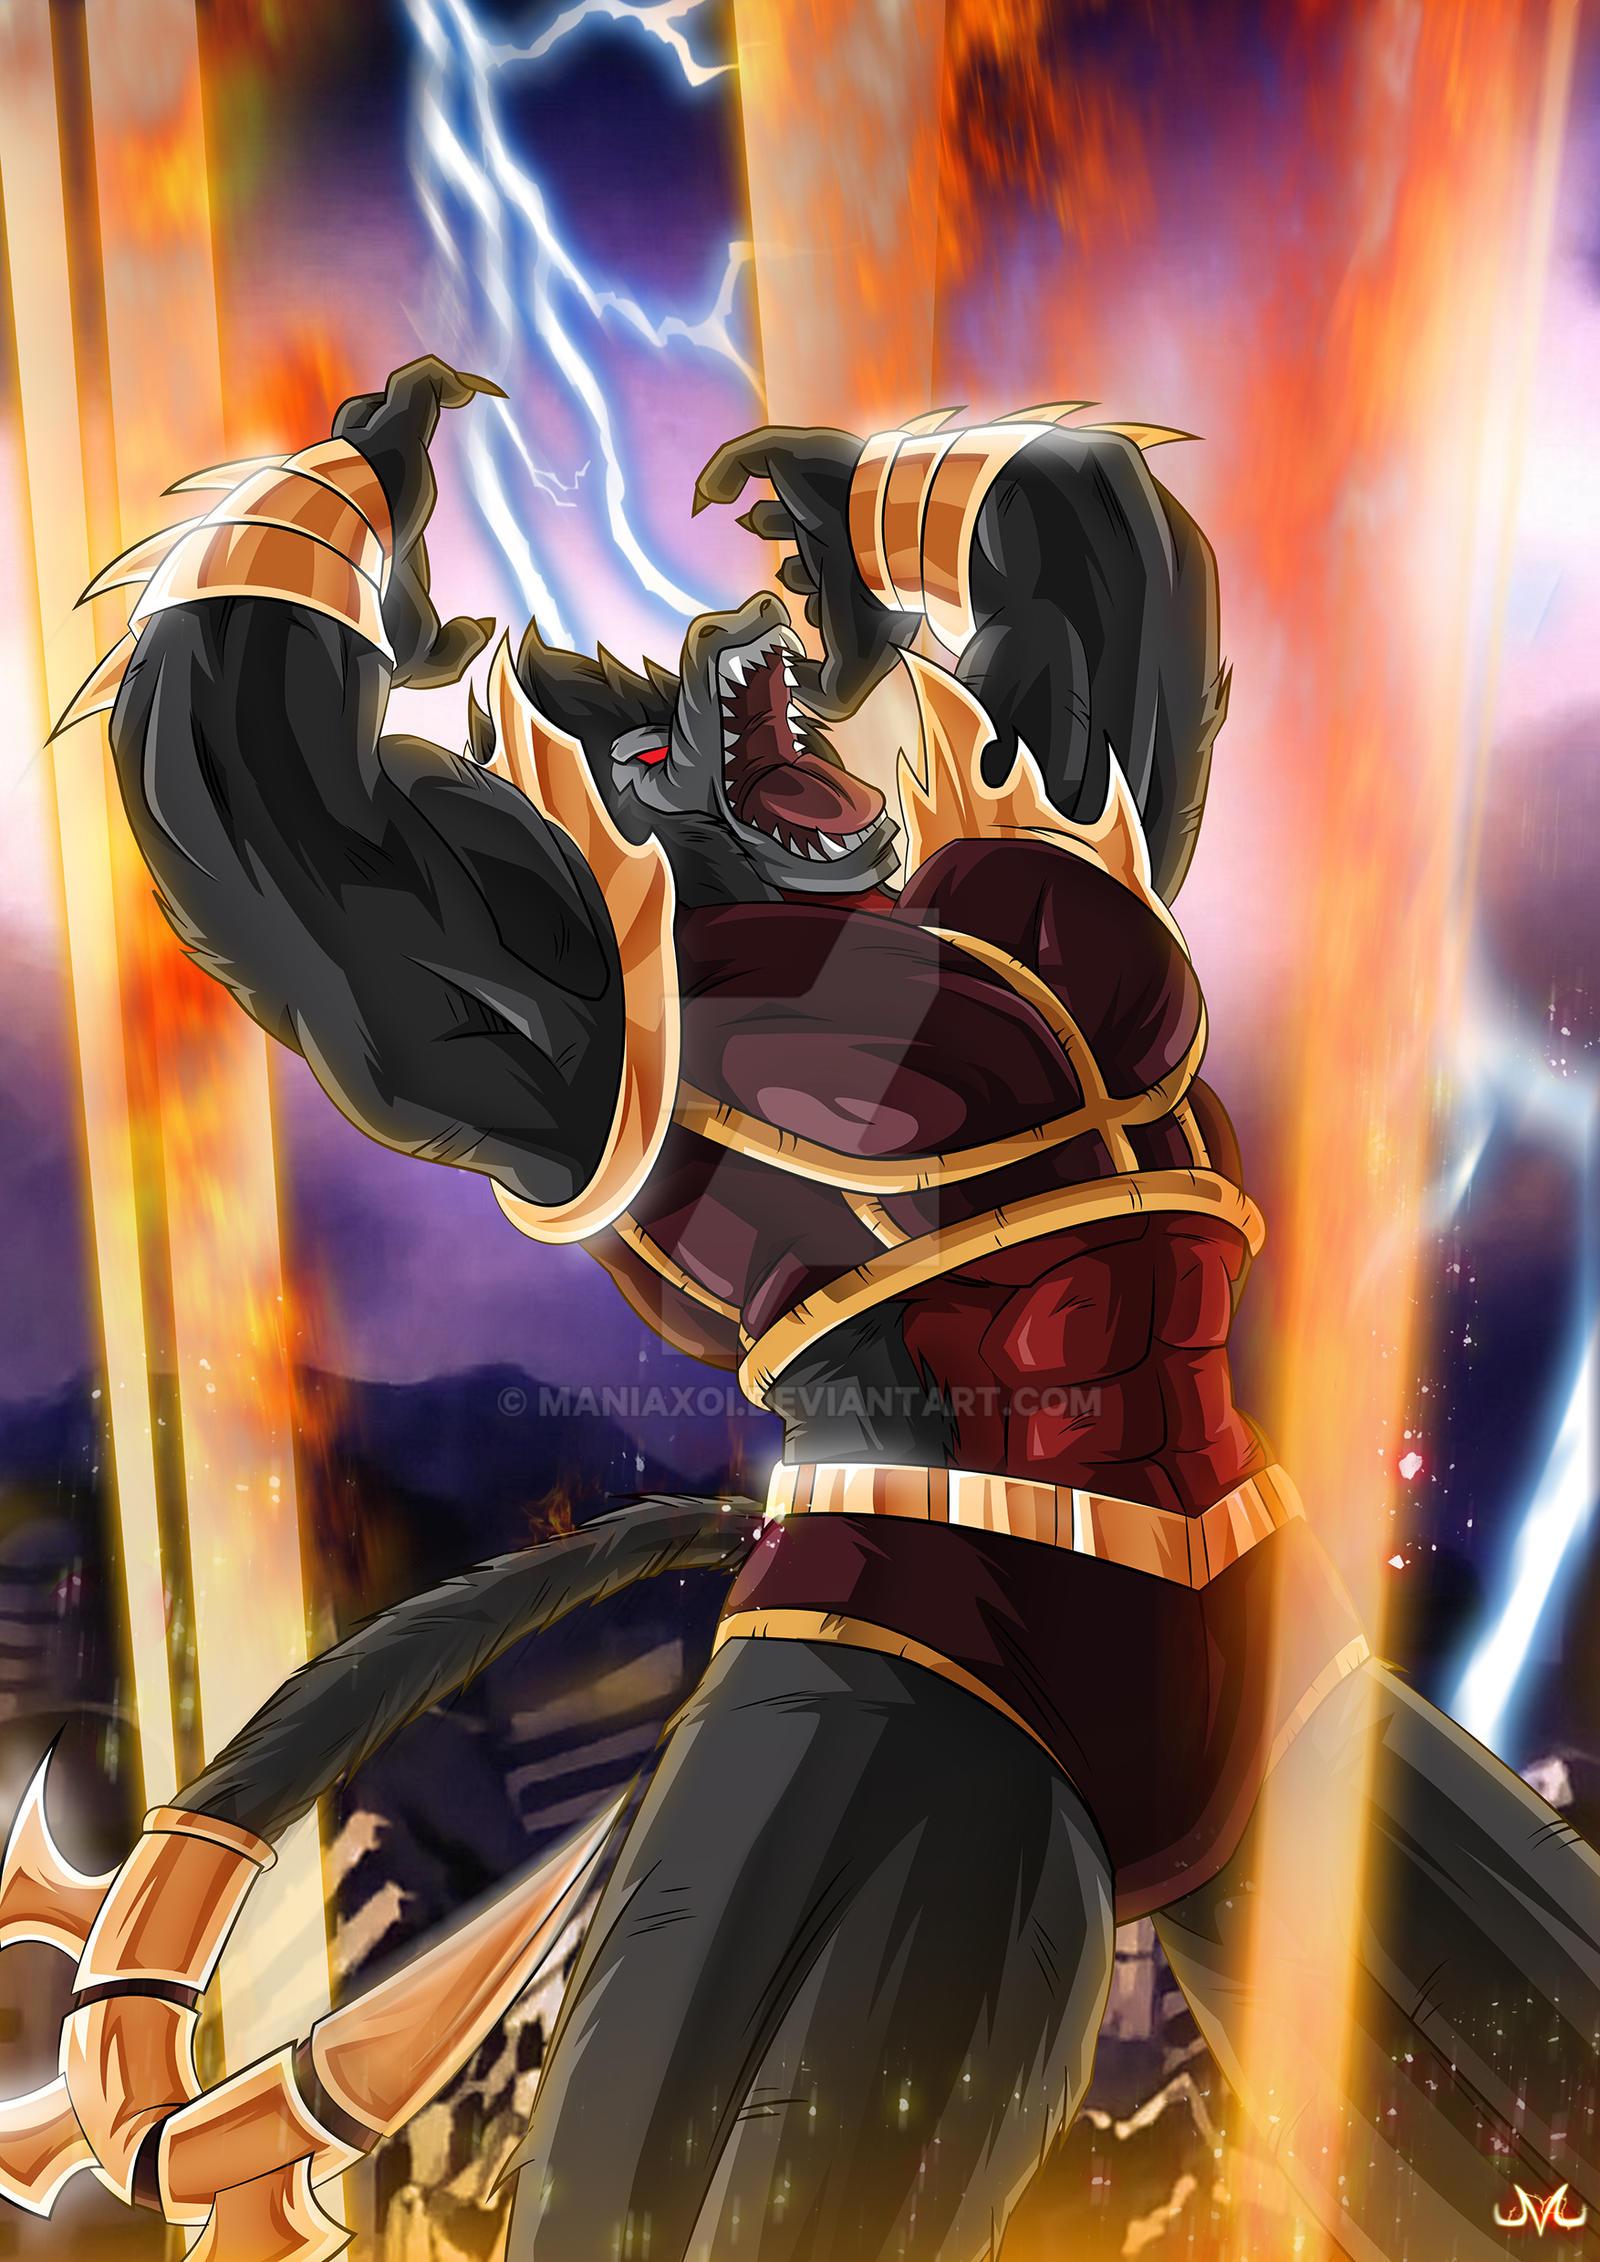 Goku vs broly fan animation - 4 8